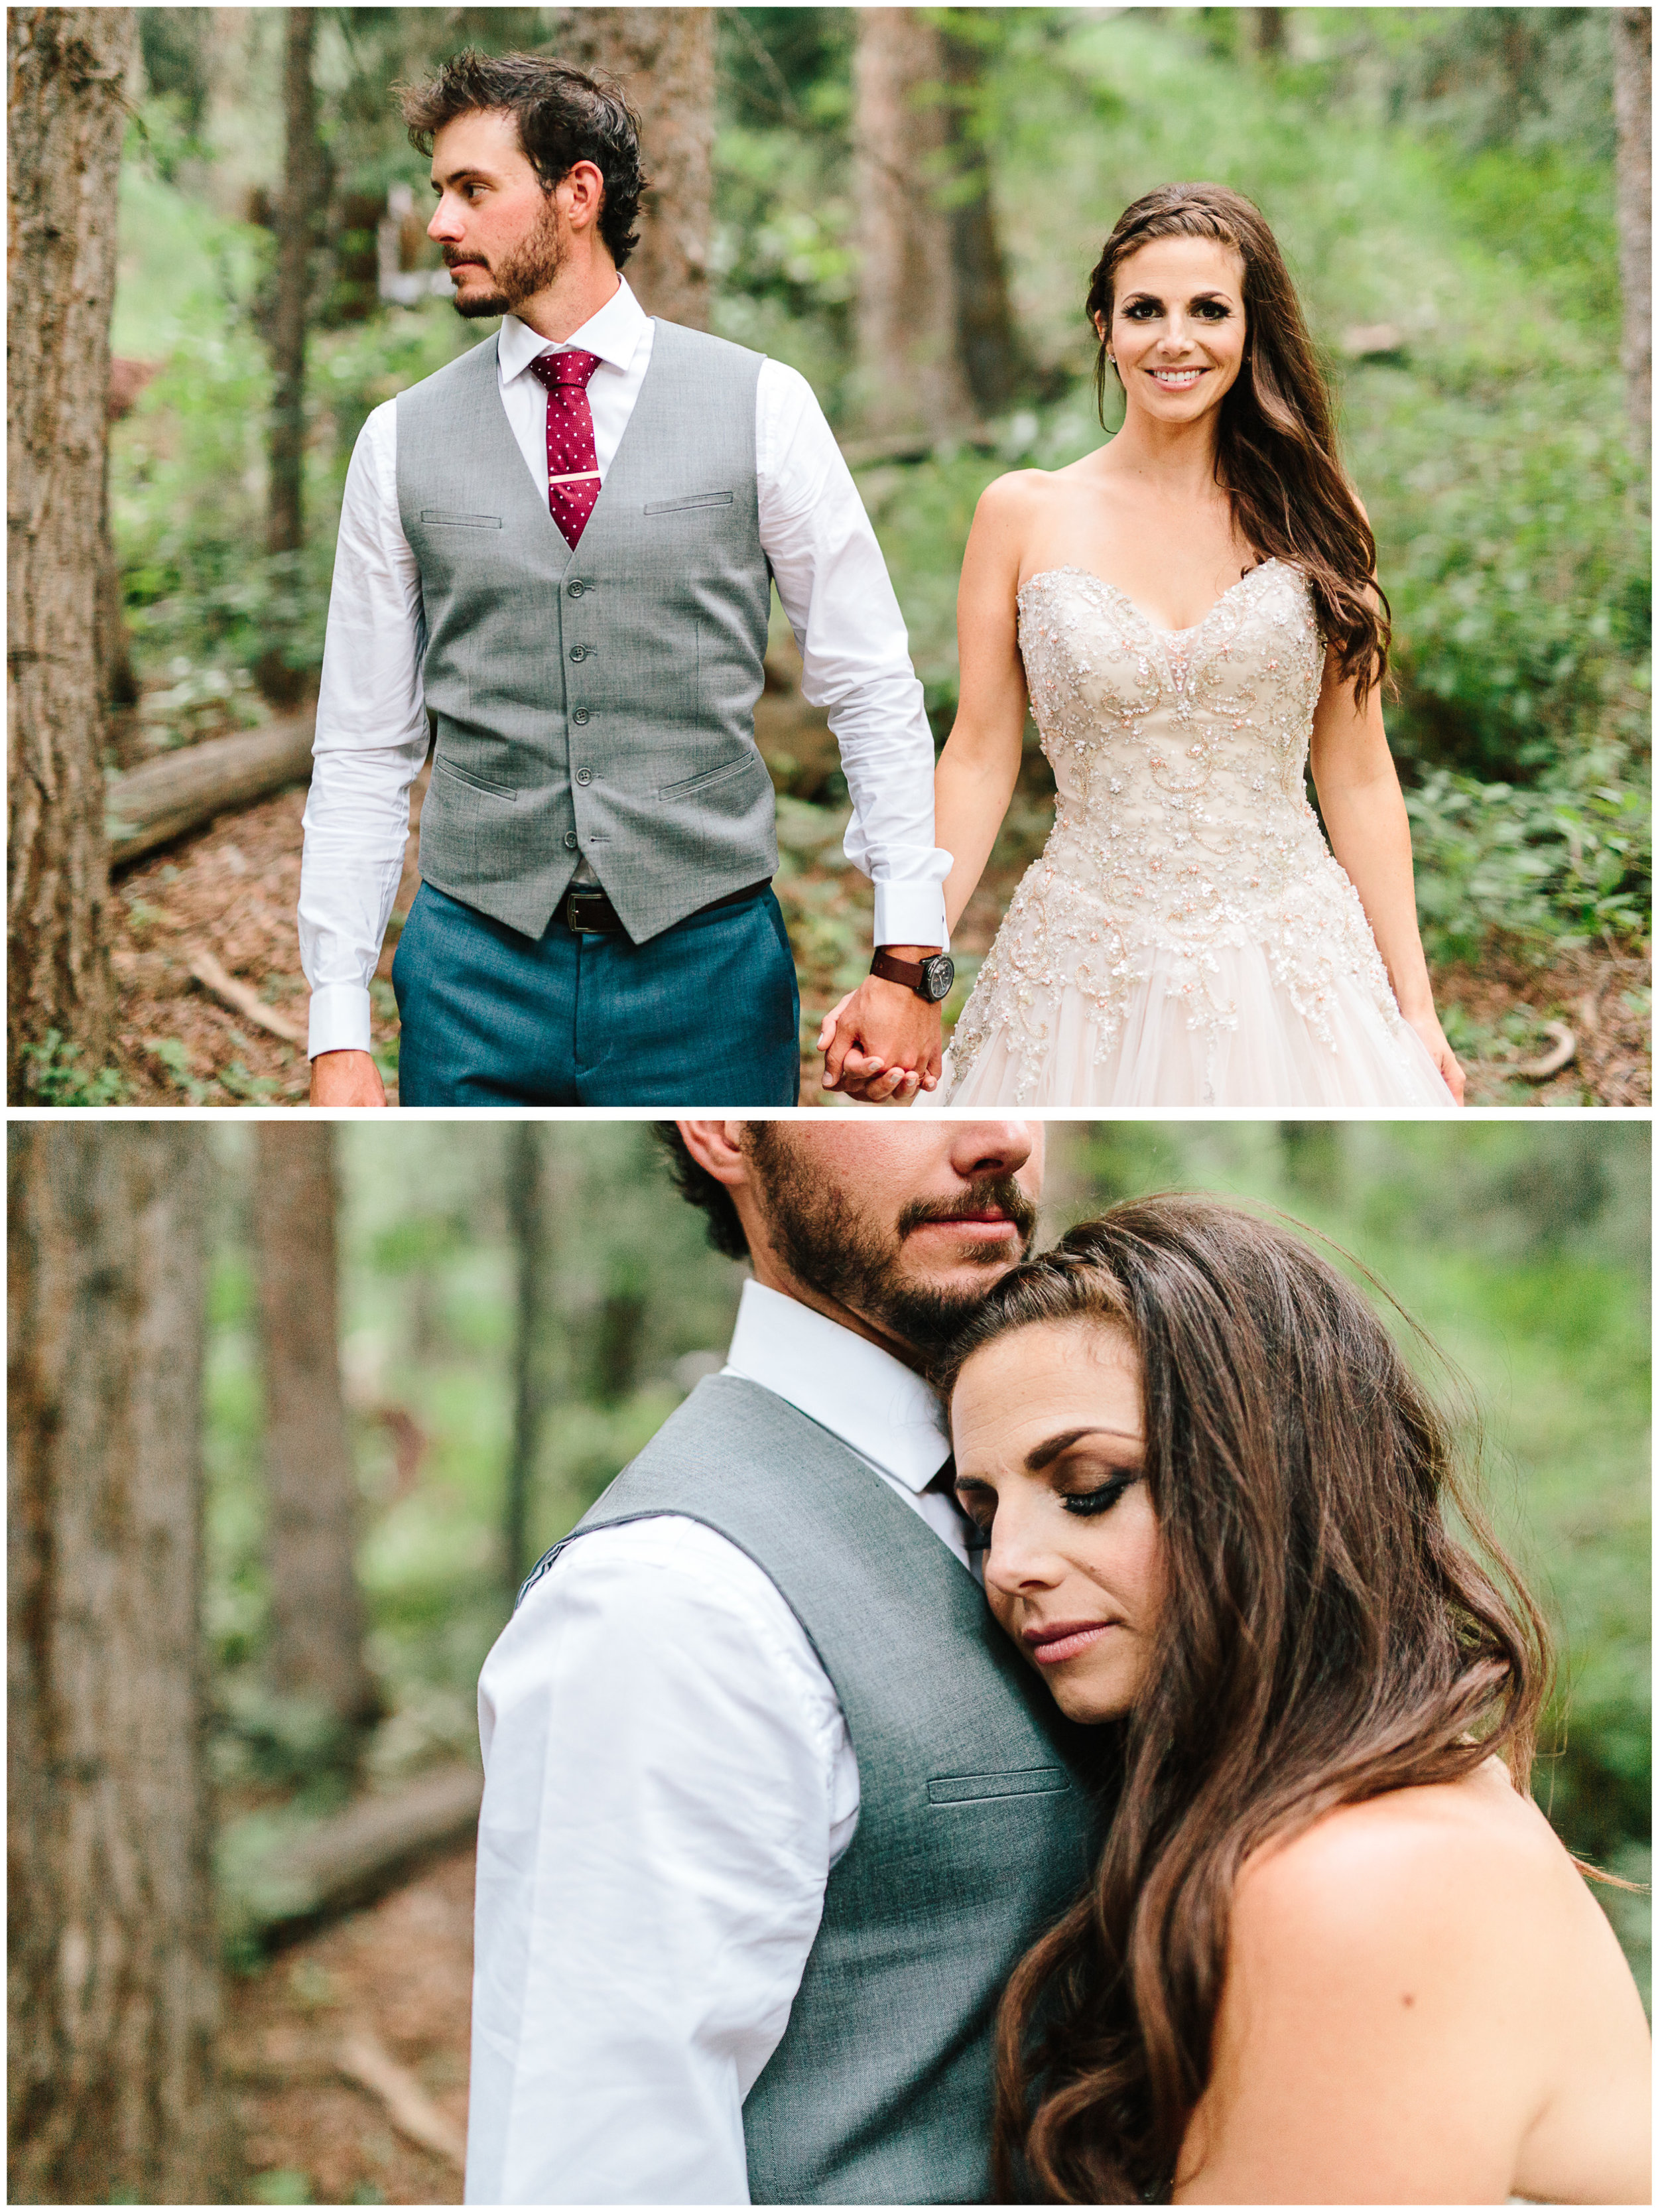 aspen_wedding_64.jpg